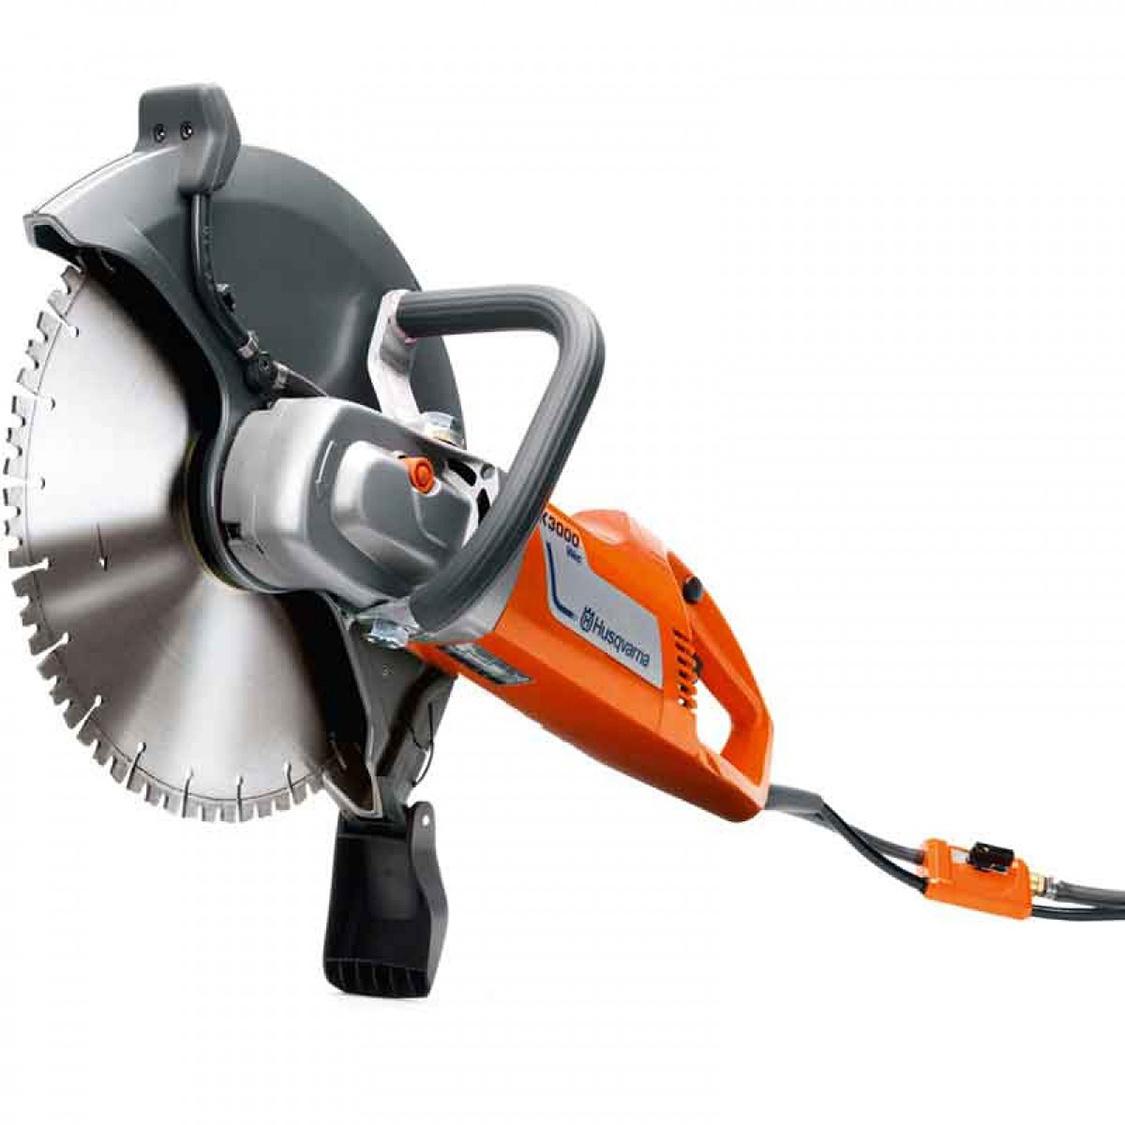 Husqvarna-K4000-ElectricCutOffSaw-silo-oem.jpg